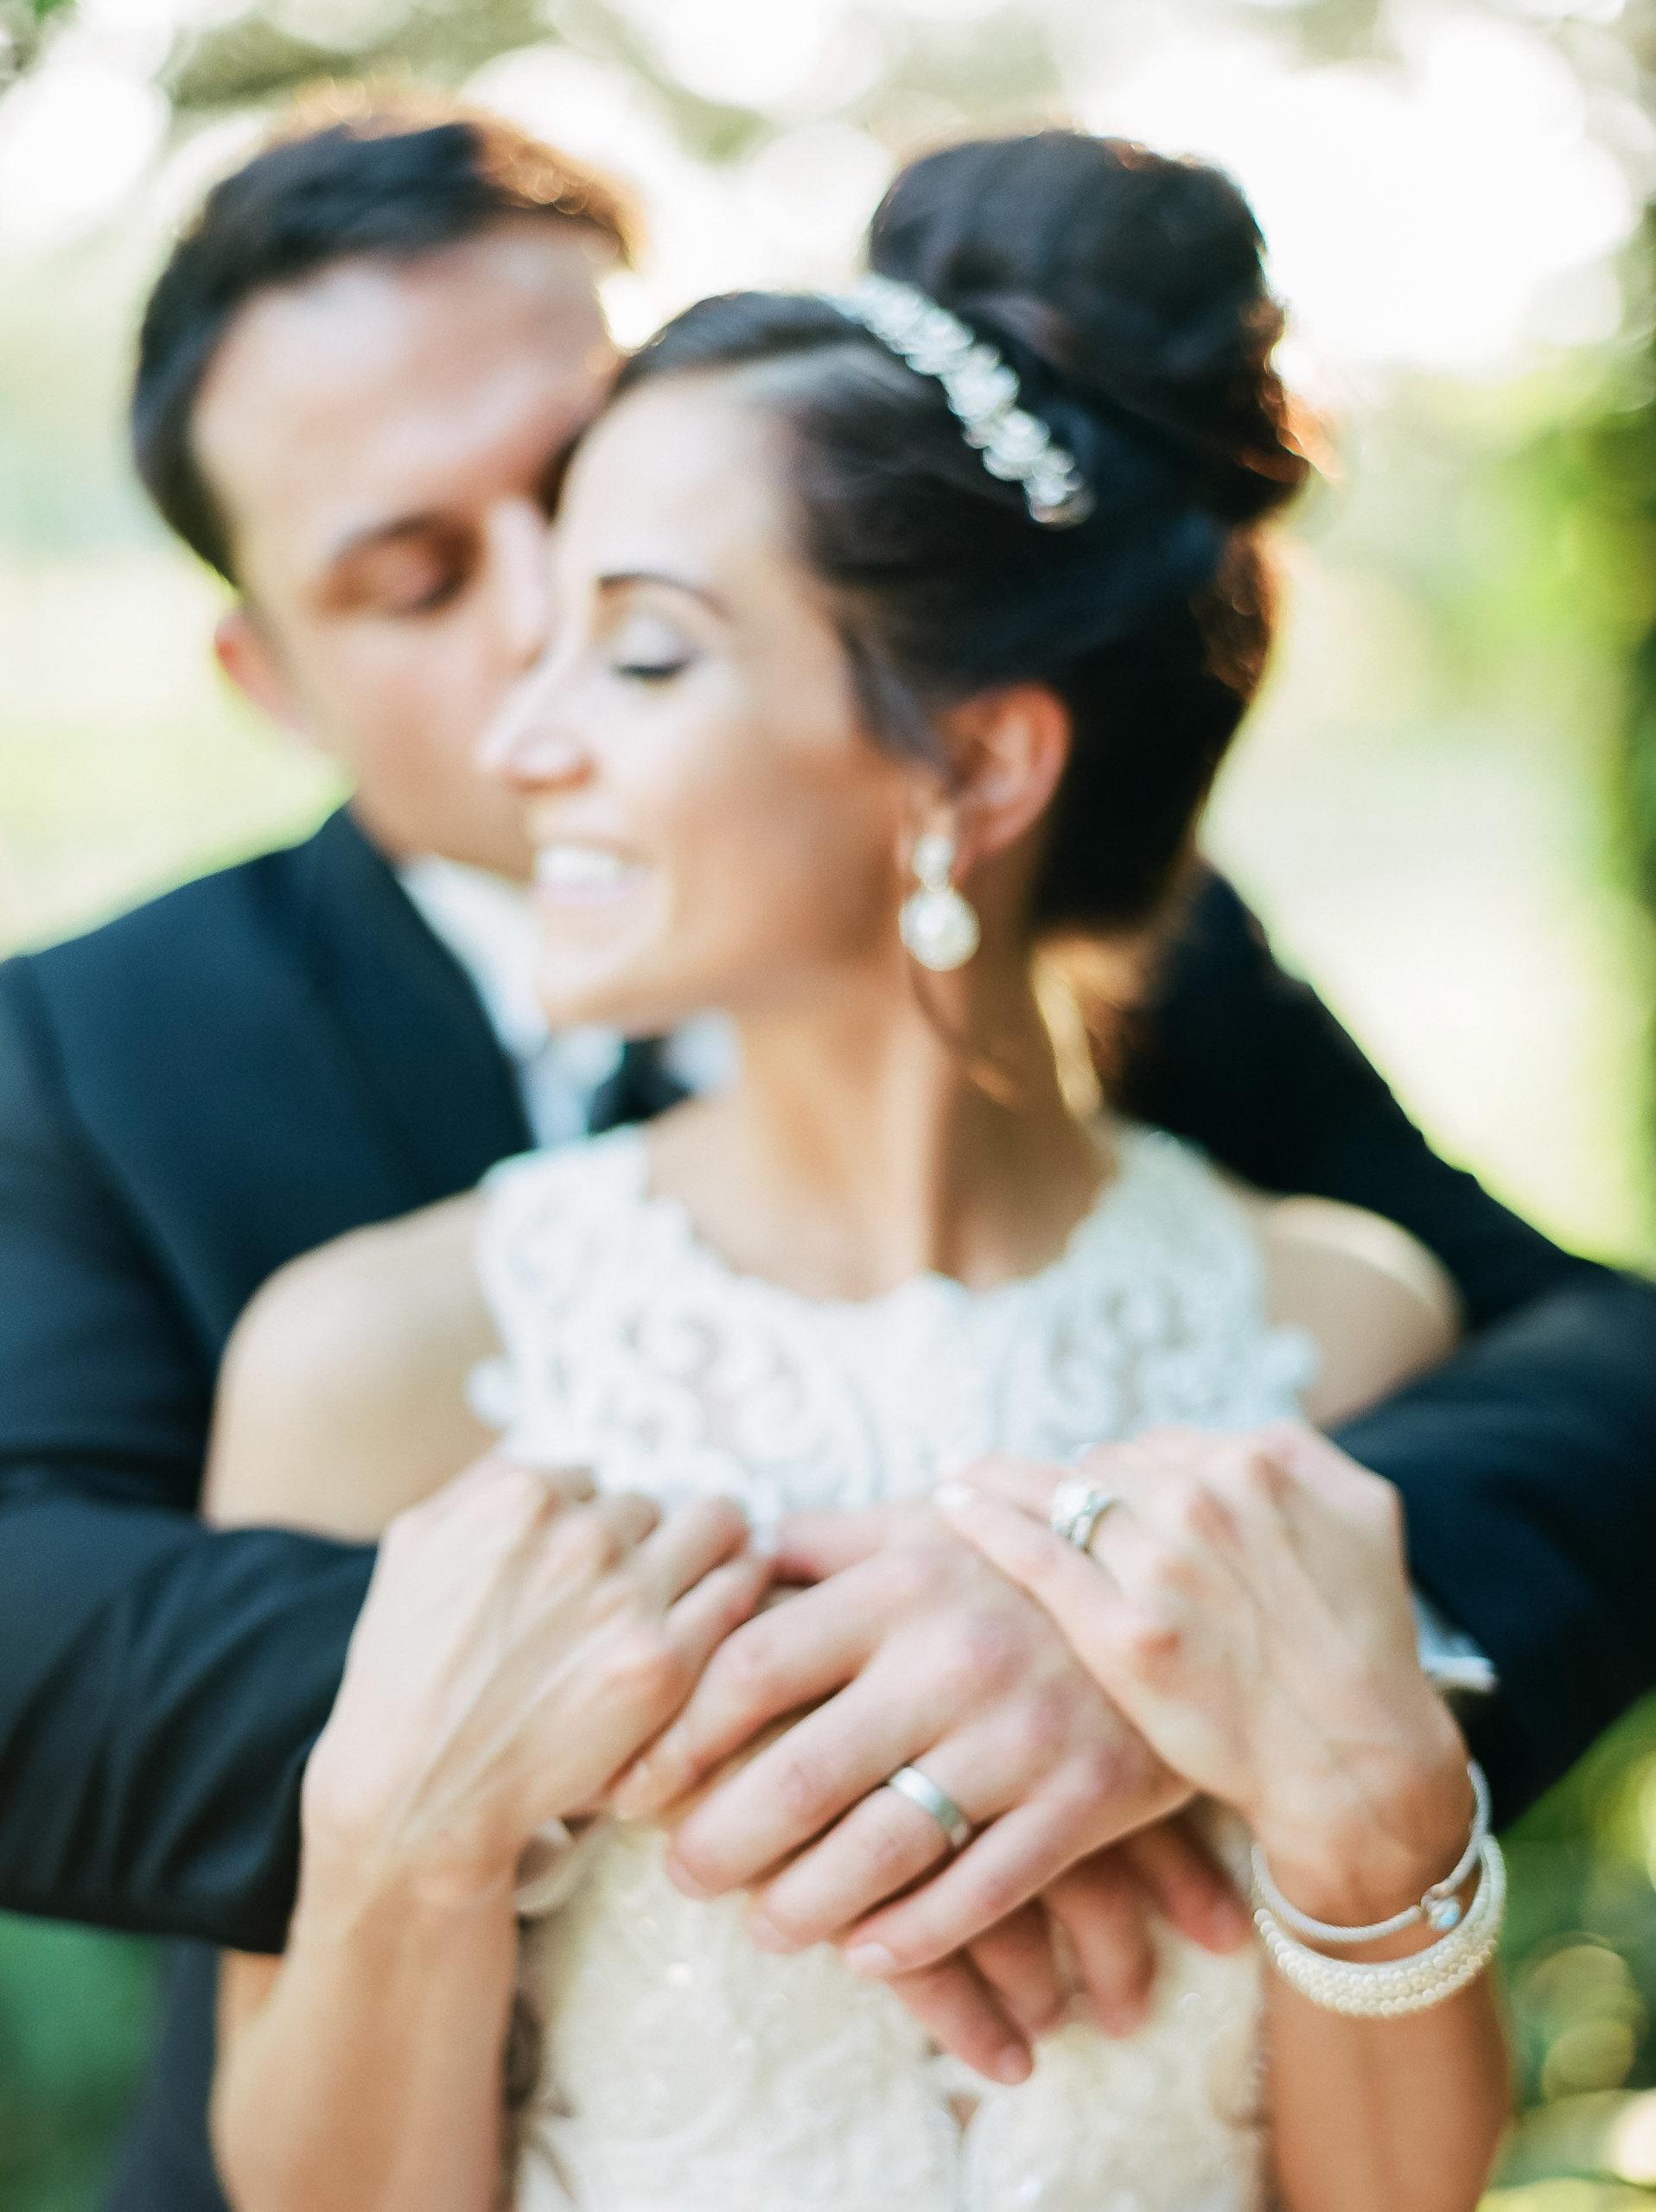 MagdalenaStudios_WeddingPhotographer_WillowCreekWinery_CarissaJoe-455.jpg